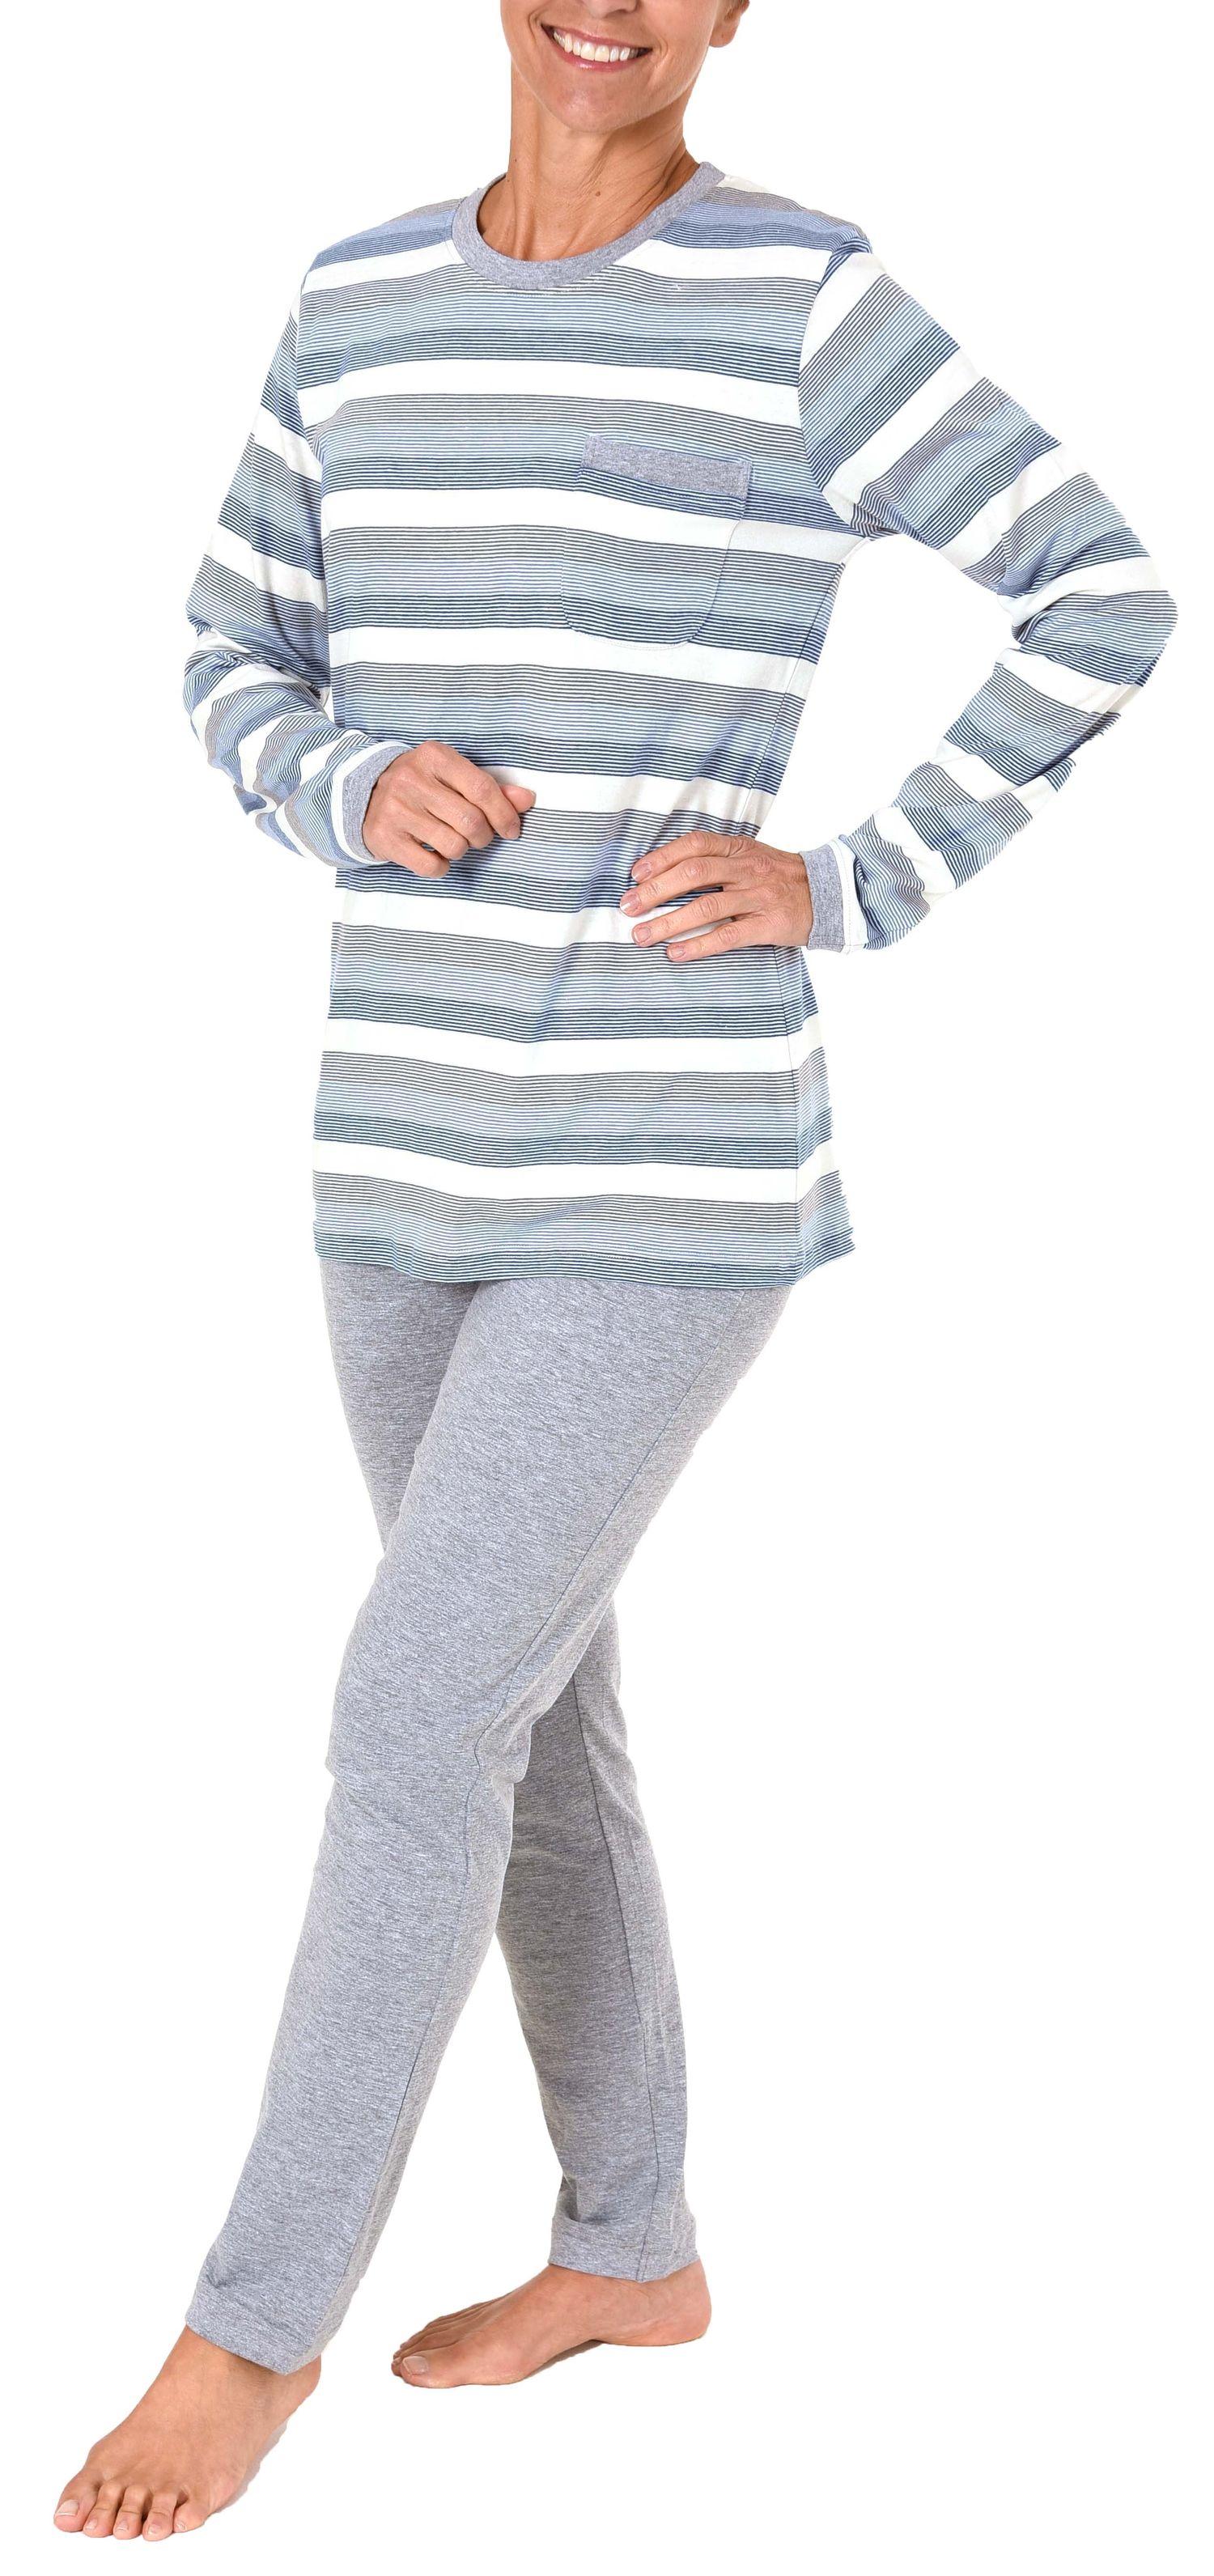 Toller Damen Pyjama langarm - auch in Übergrössen - wunderschöne Block Streifen Optik  – Bild 3